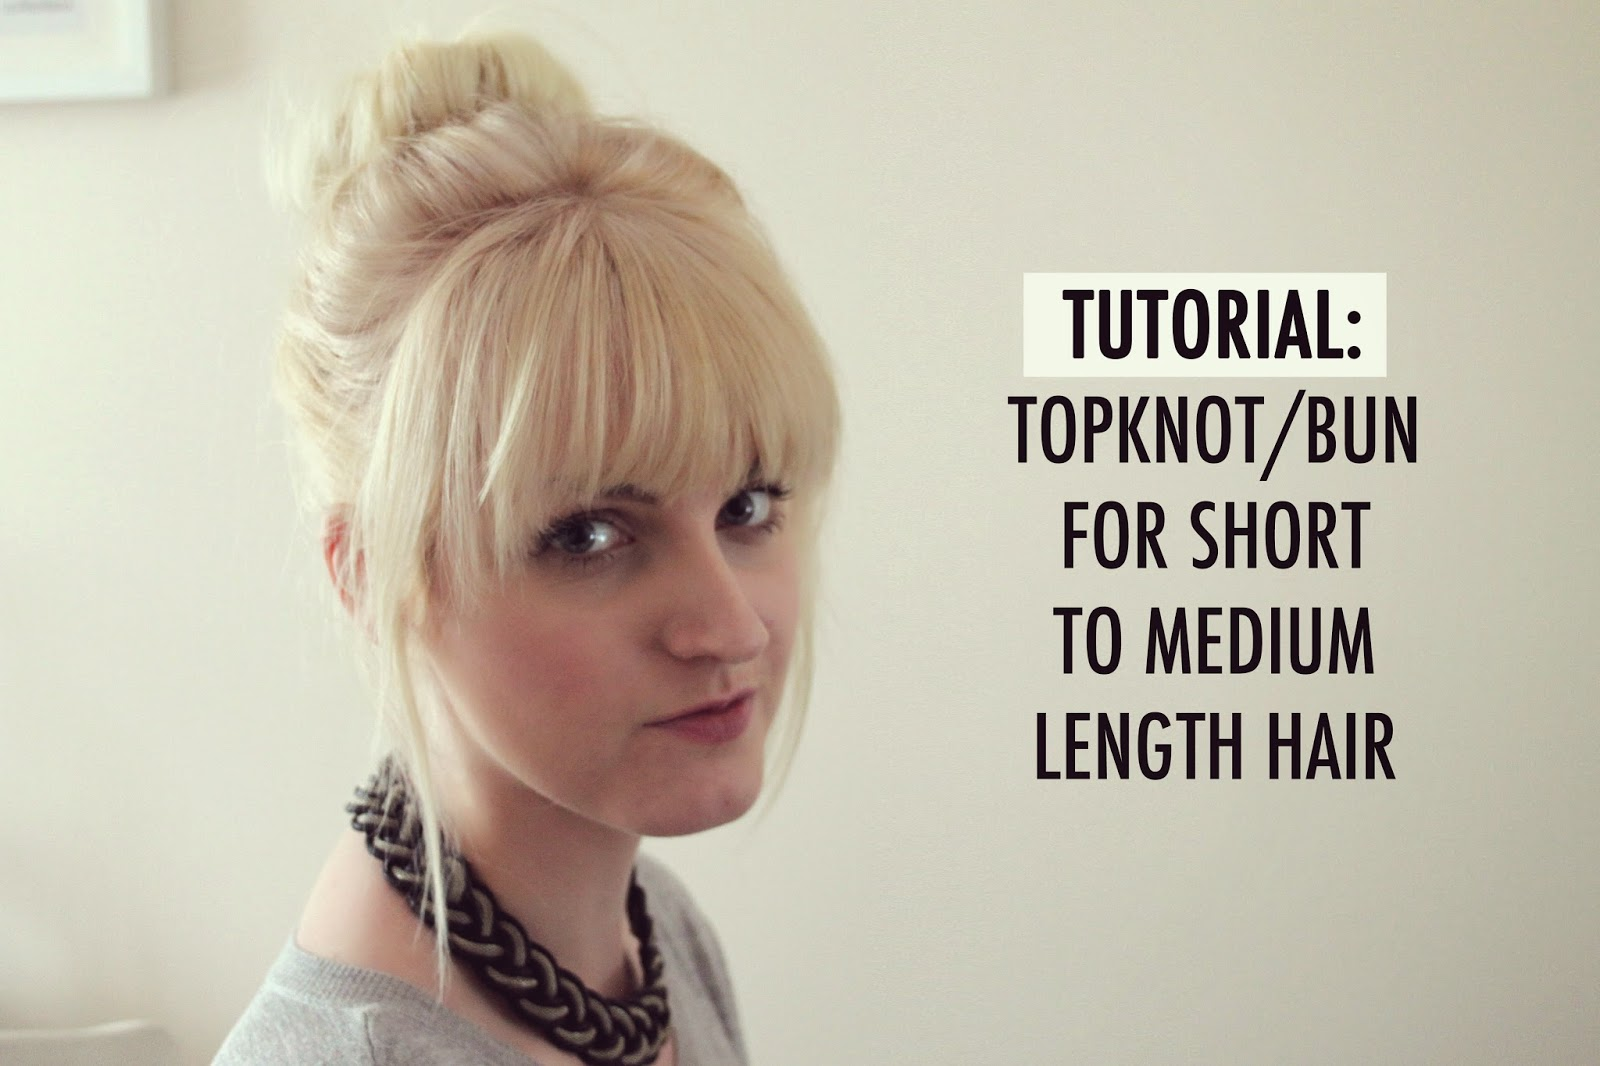 tutorial topknotbun for short to medium length hair